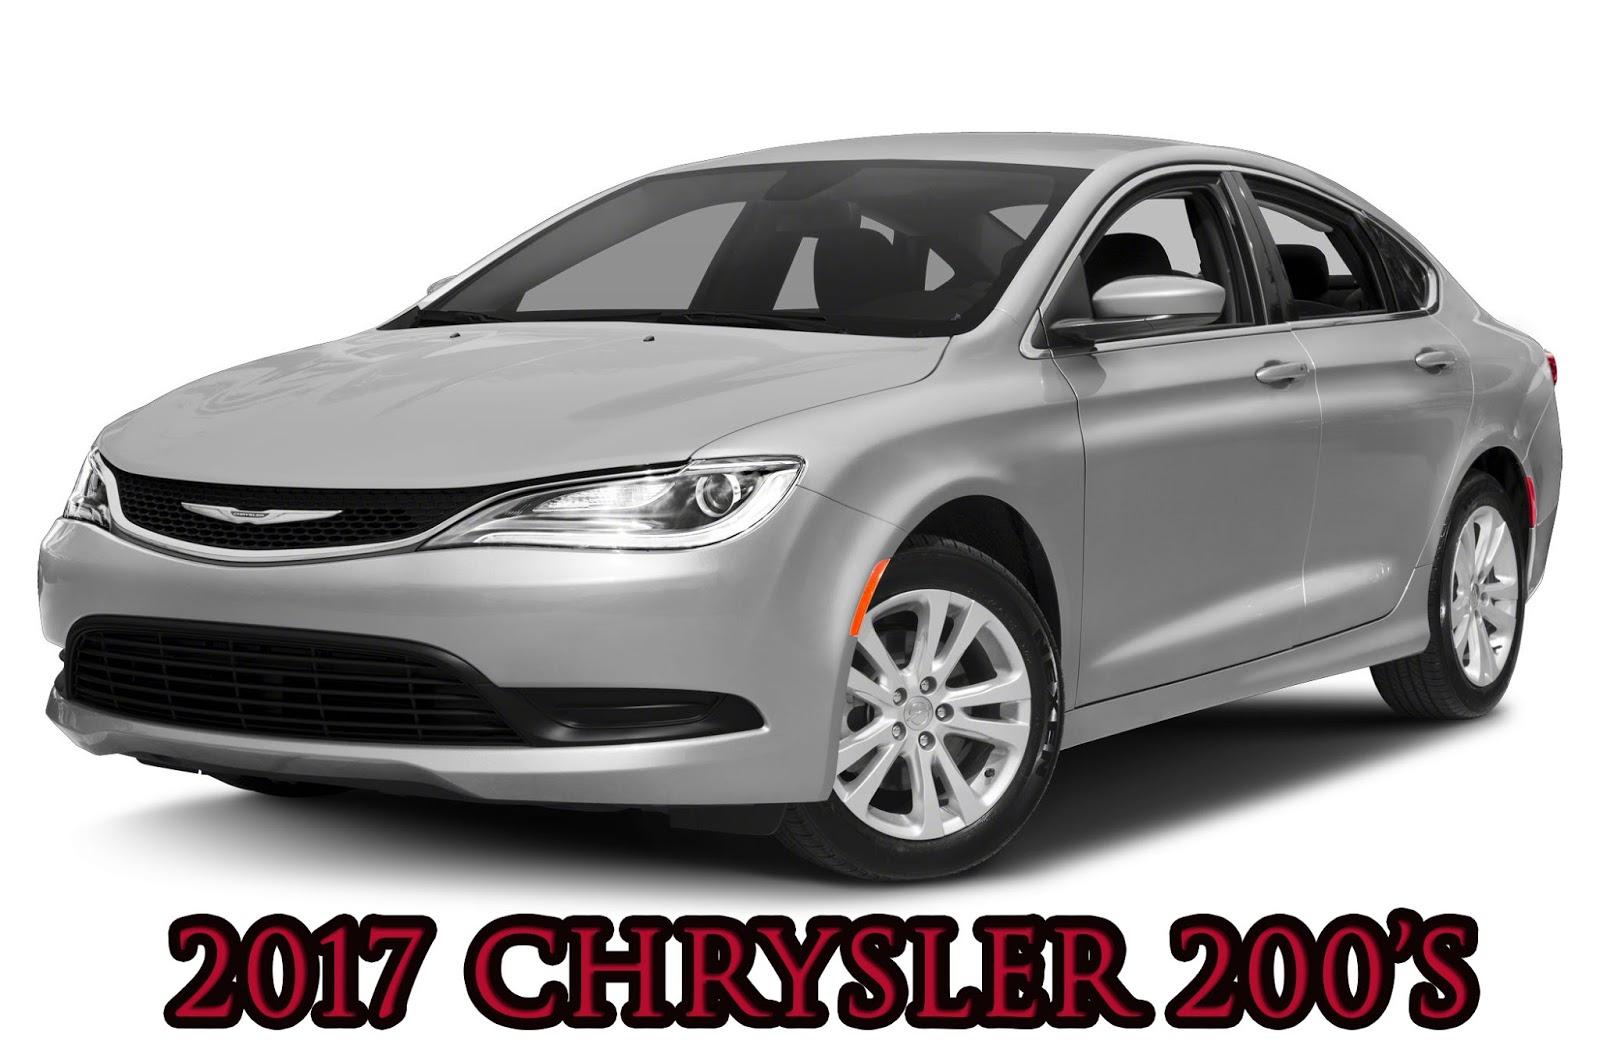 New Car Test Drive >> 2017 Chrysler 200's Reviews : New Car Test Drive